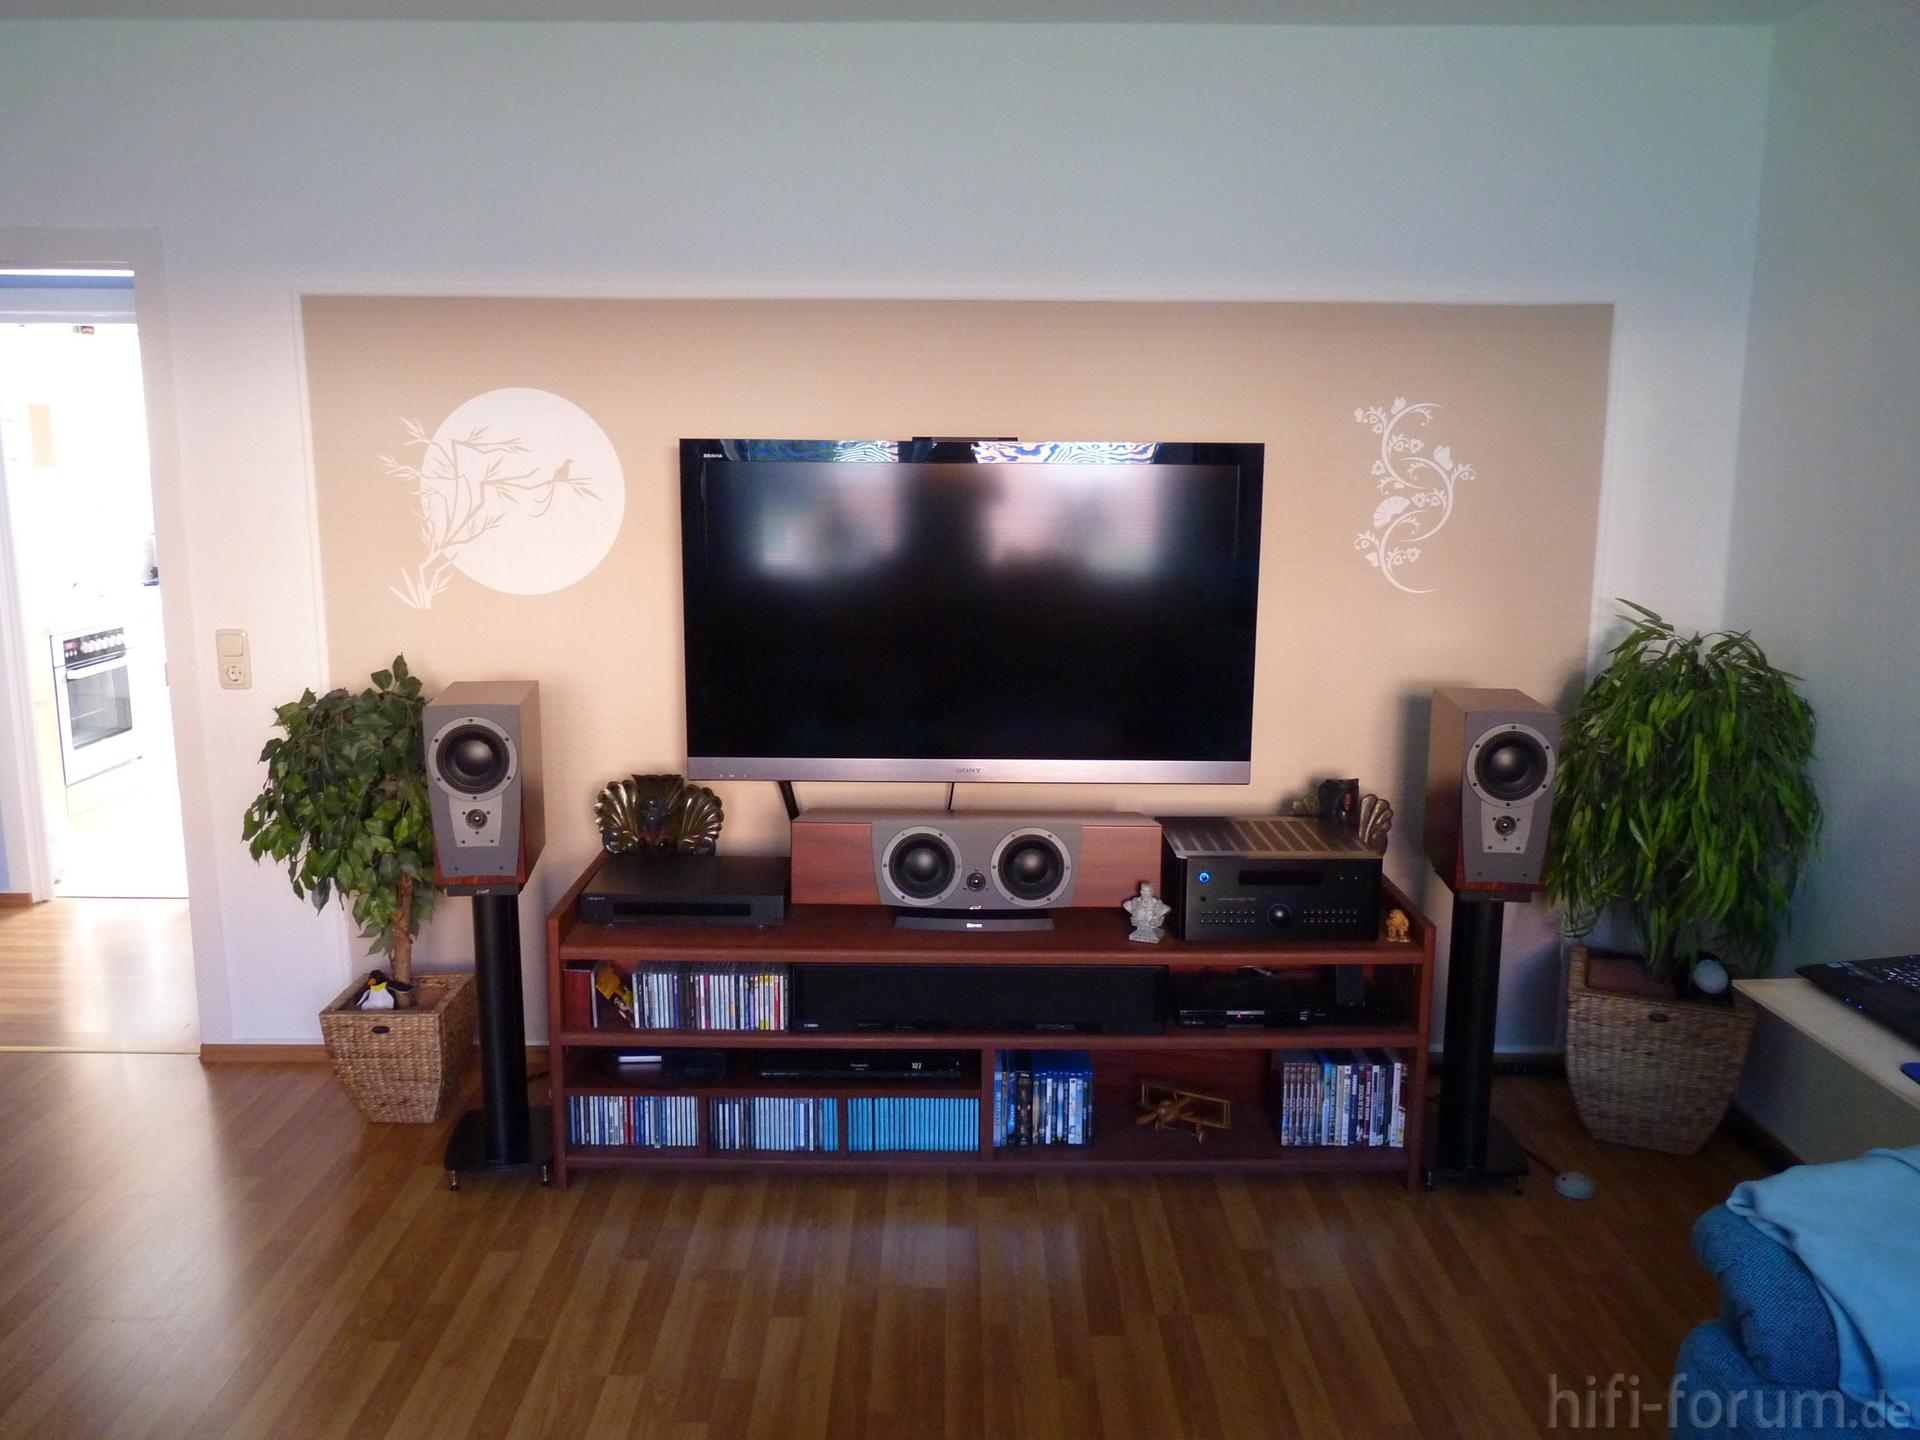 p1010350 lautsprecher stereo hifi bildergalerie. Black Bedroom Furniture Sets. Home Design Ideas